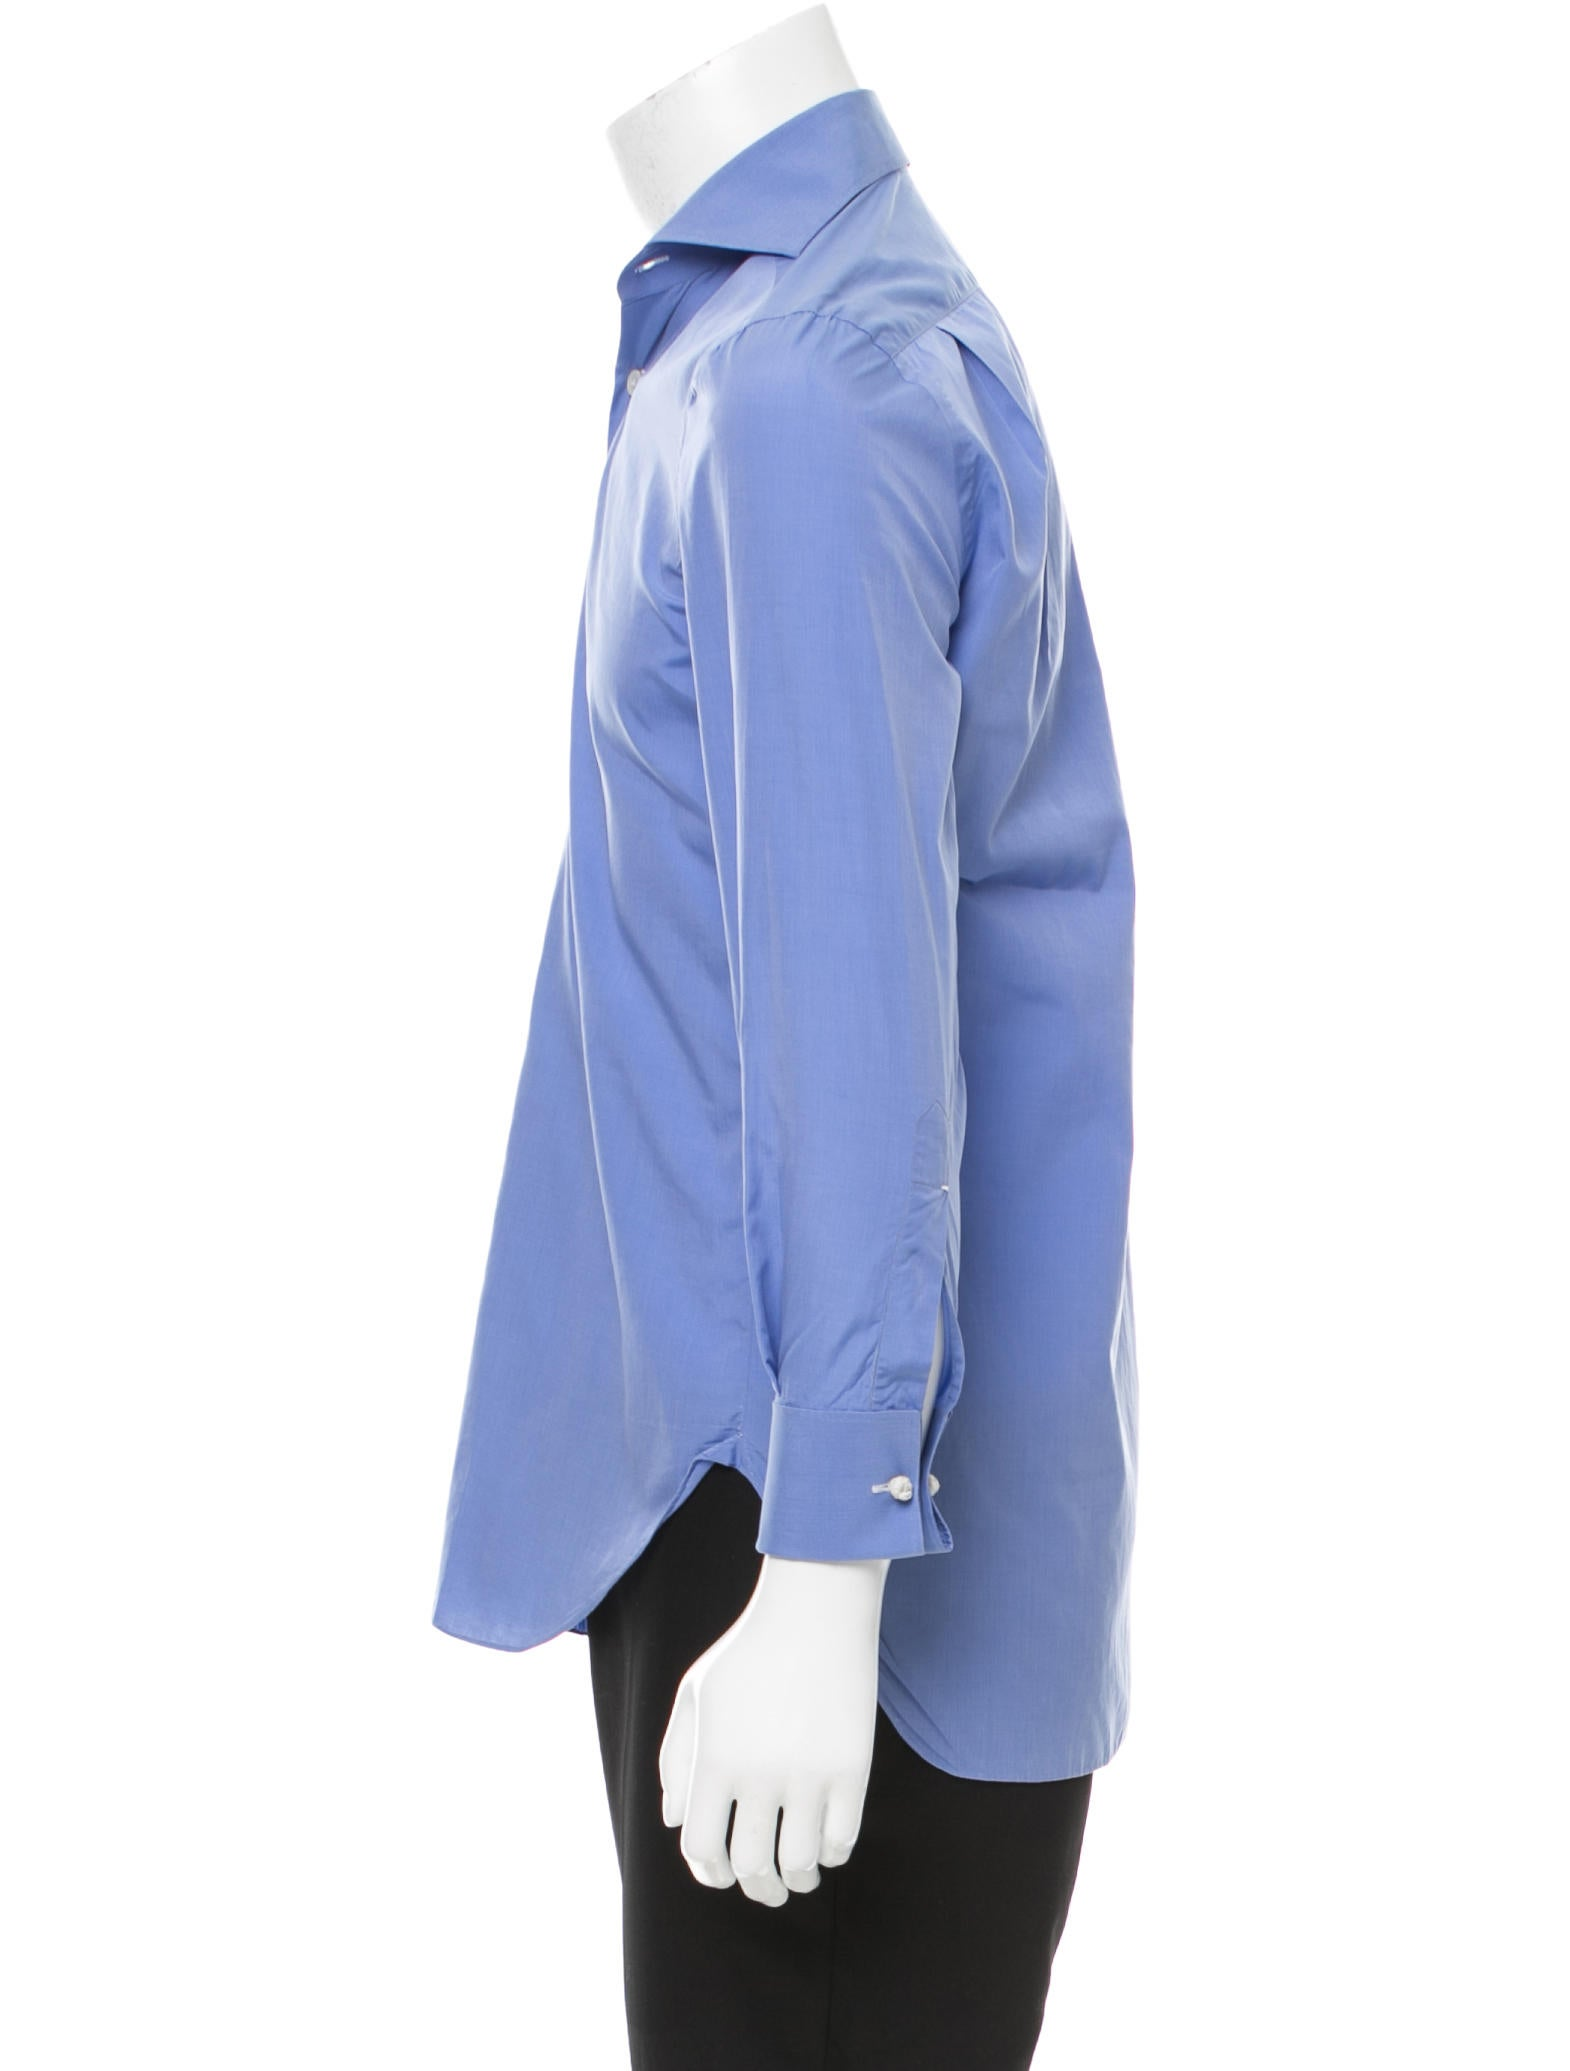 Kiton Long Sleeve Button Up Shirt Clothing Kit21410